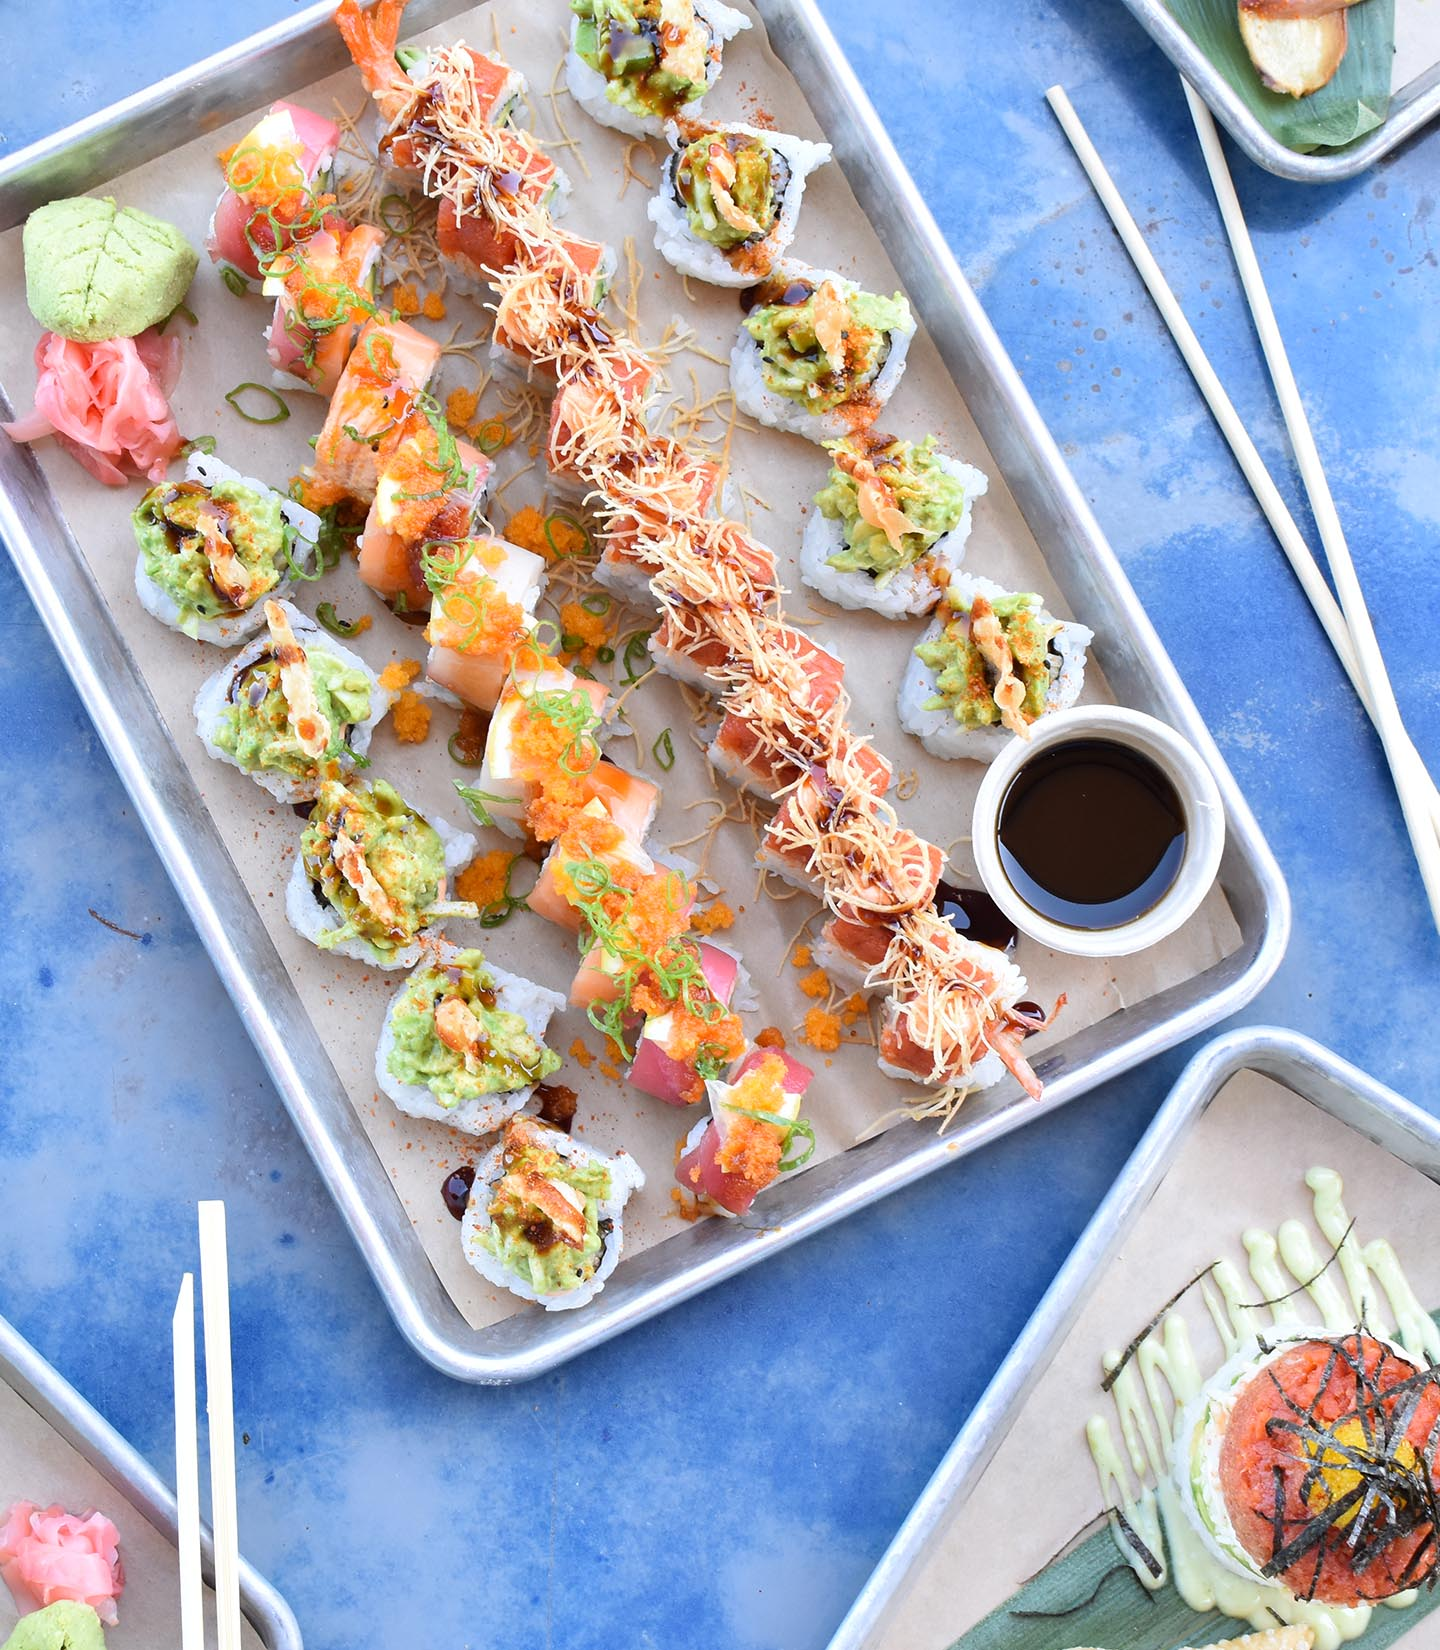 Hōru Sushi - hero